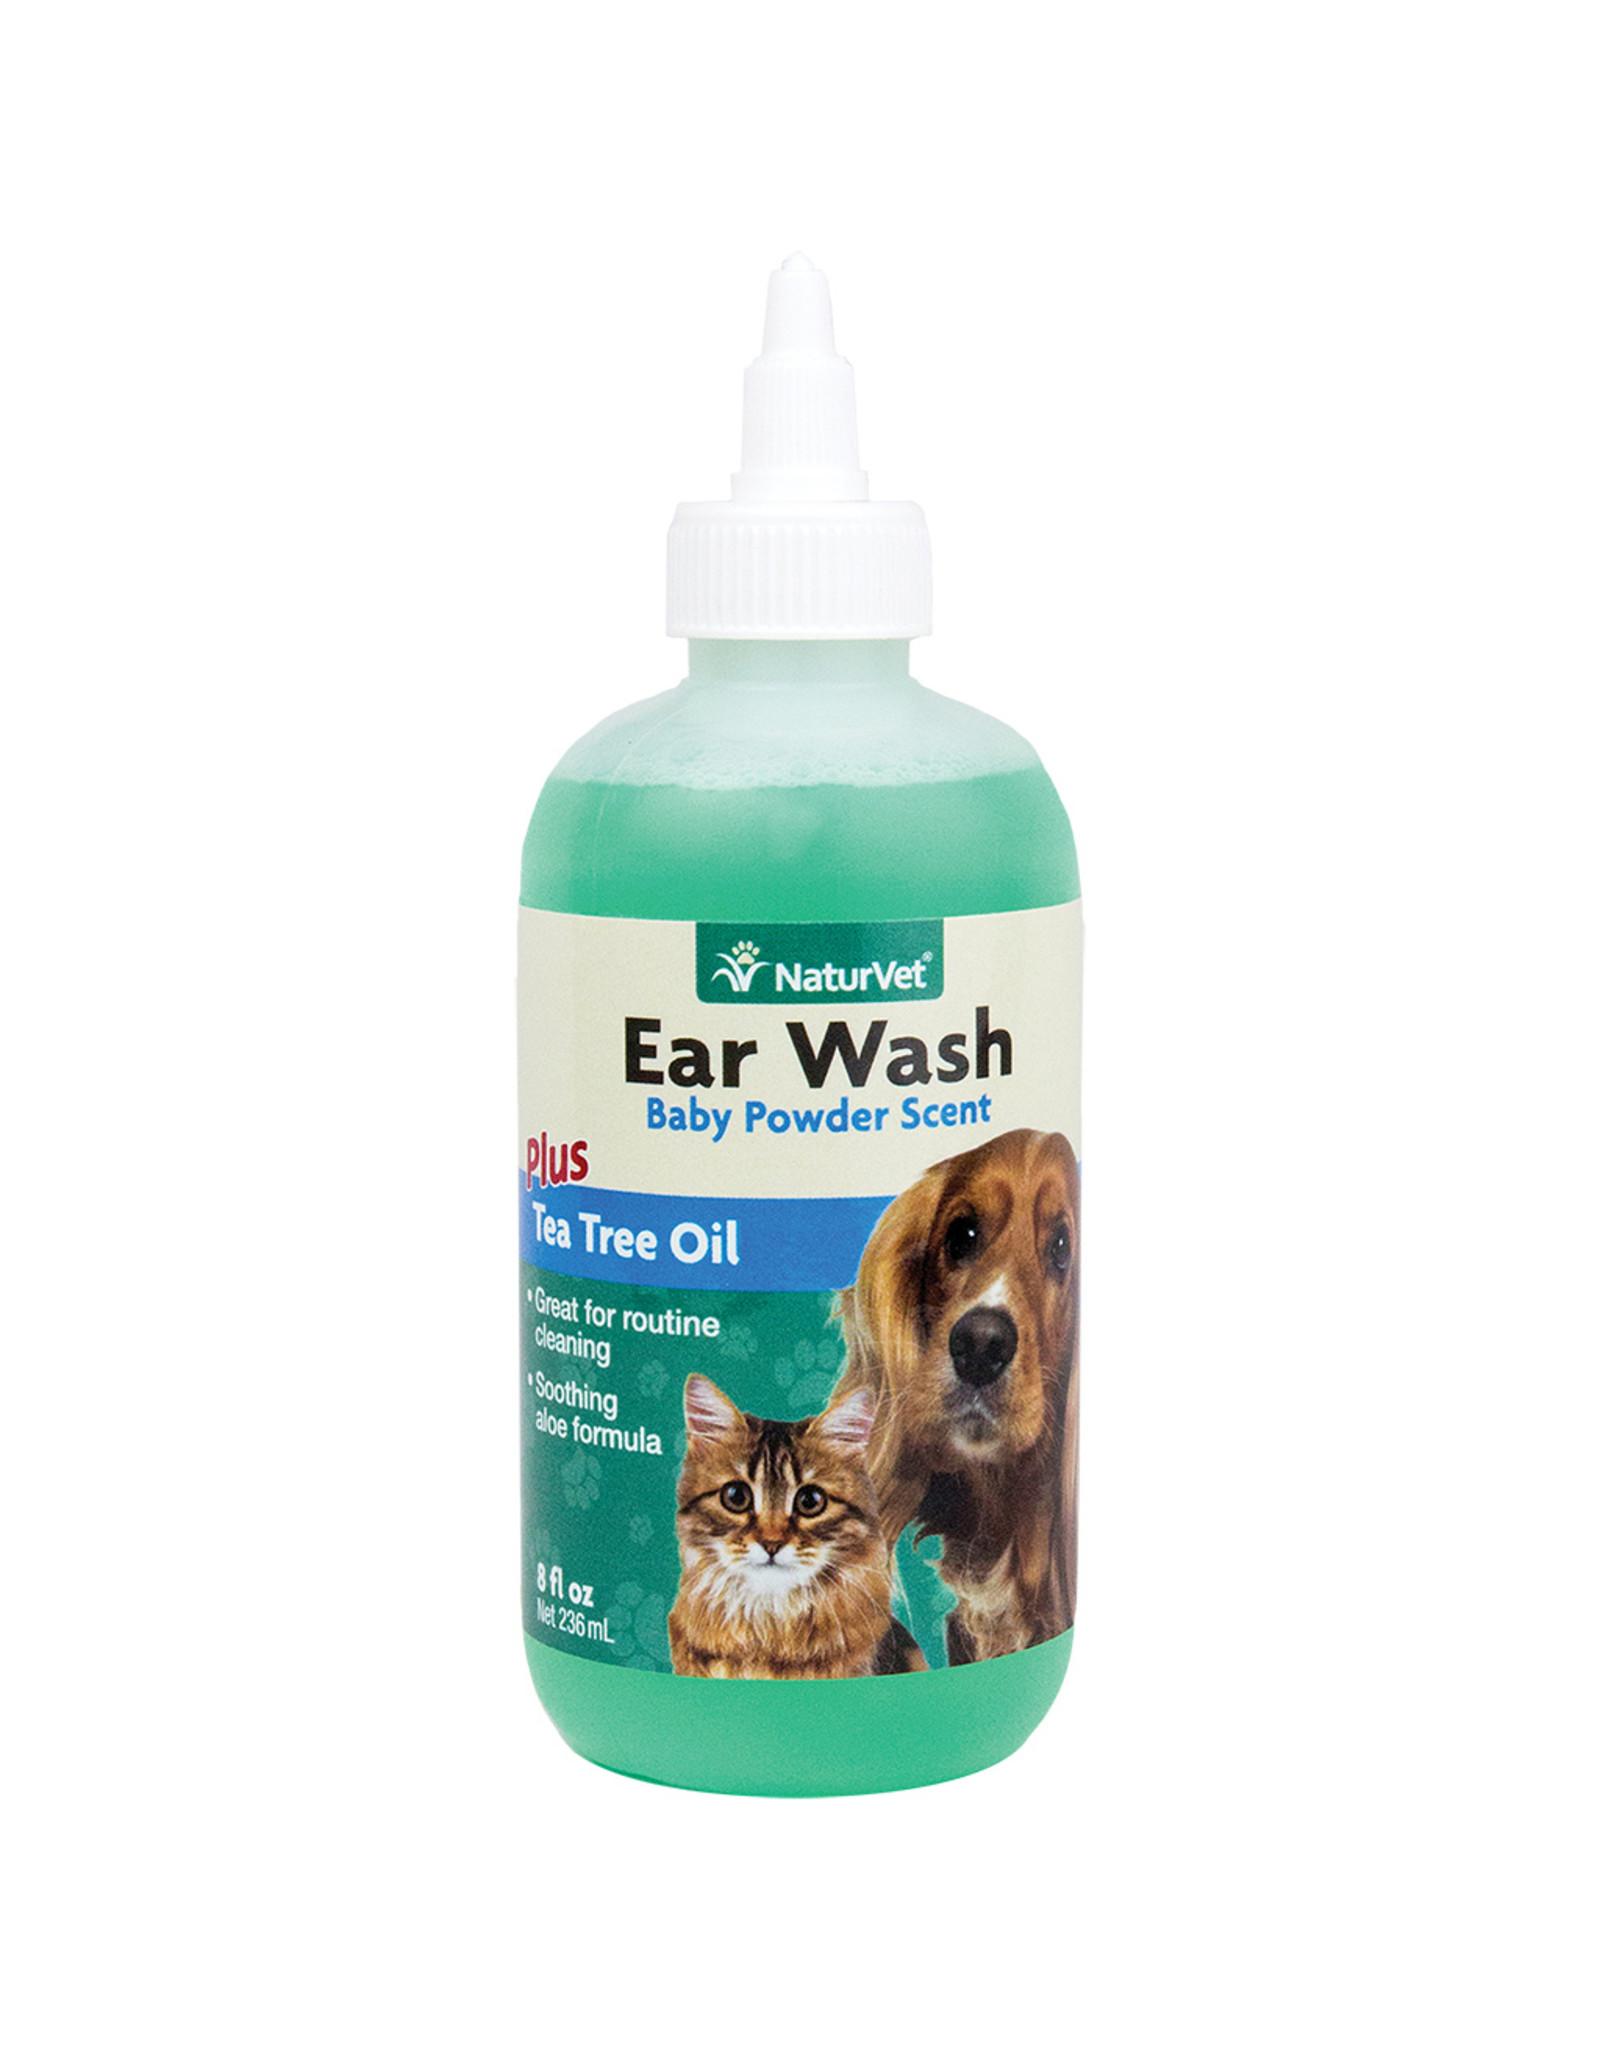 NaturVet Ear Wash Tea Tree Oil